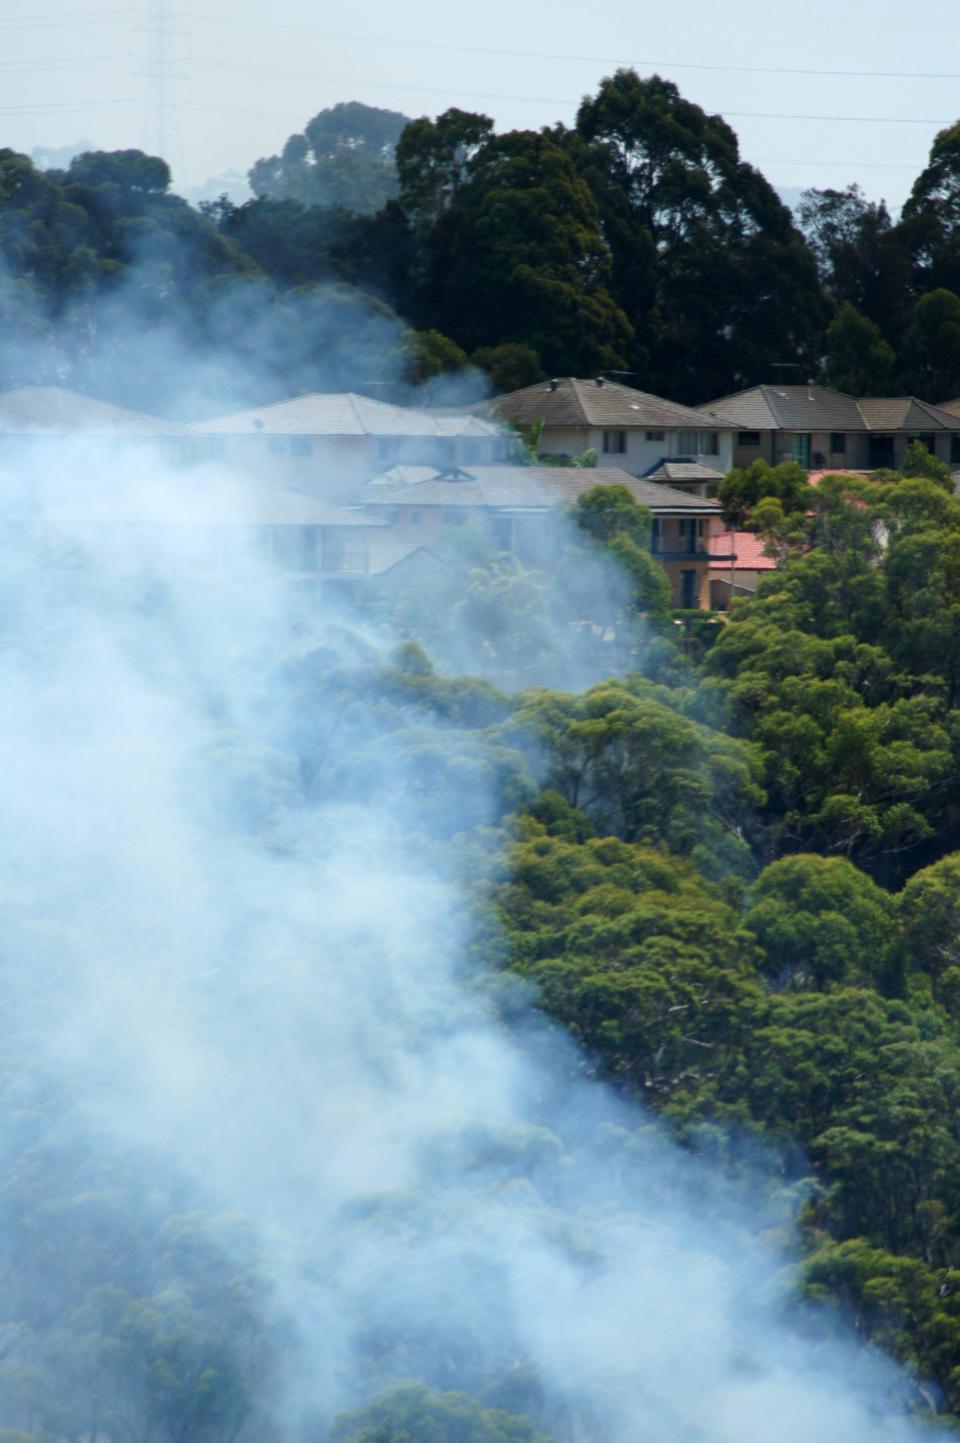 Photo credit: Anthony Clark, NSW RFS